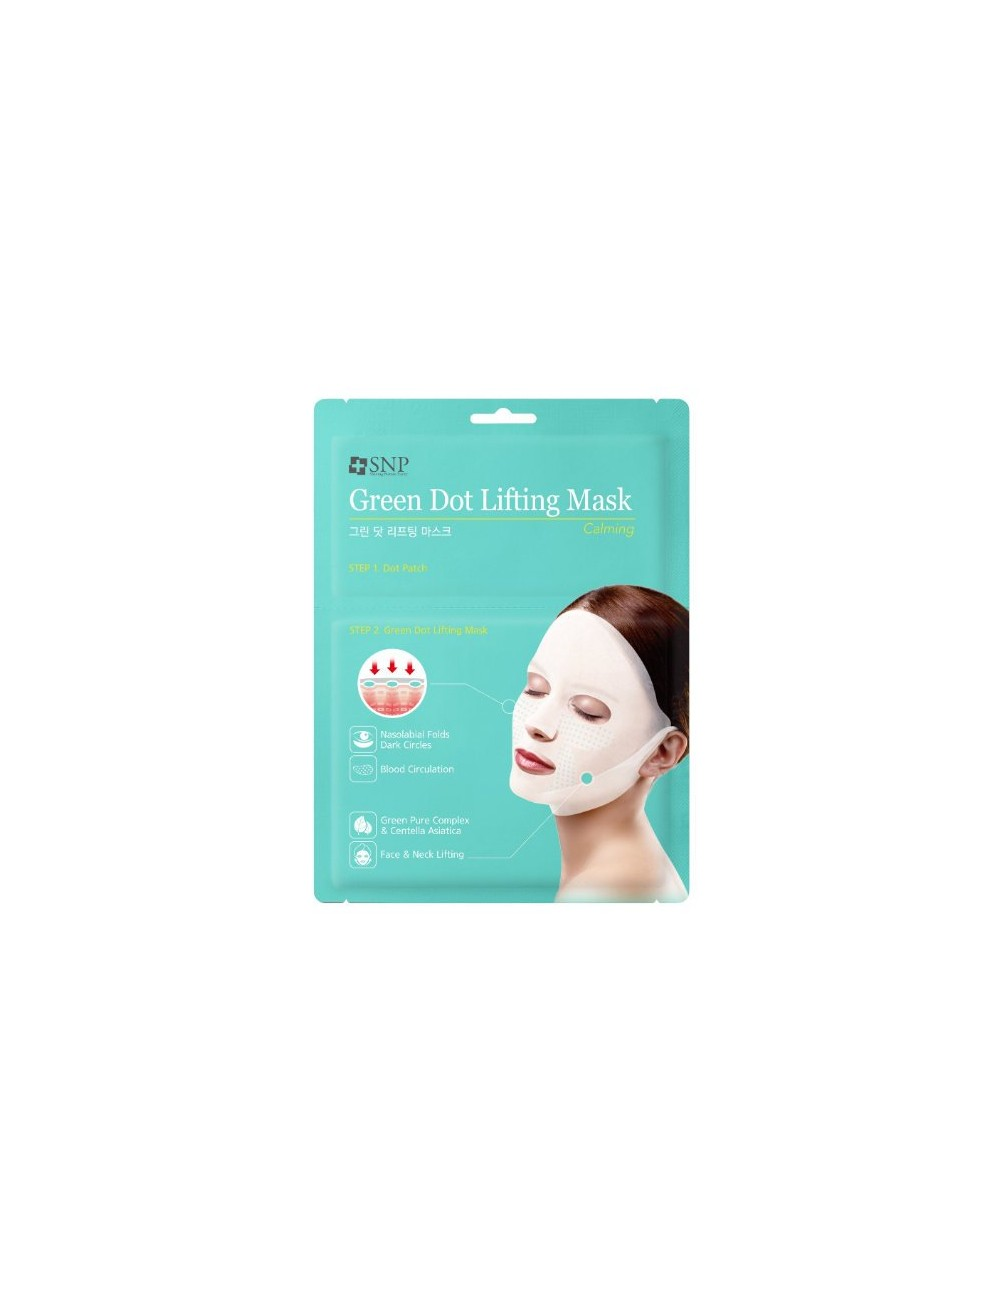 Mascarilla Lifting Calmante  SNP Green Dot Lifting Mask